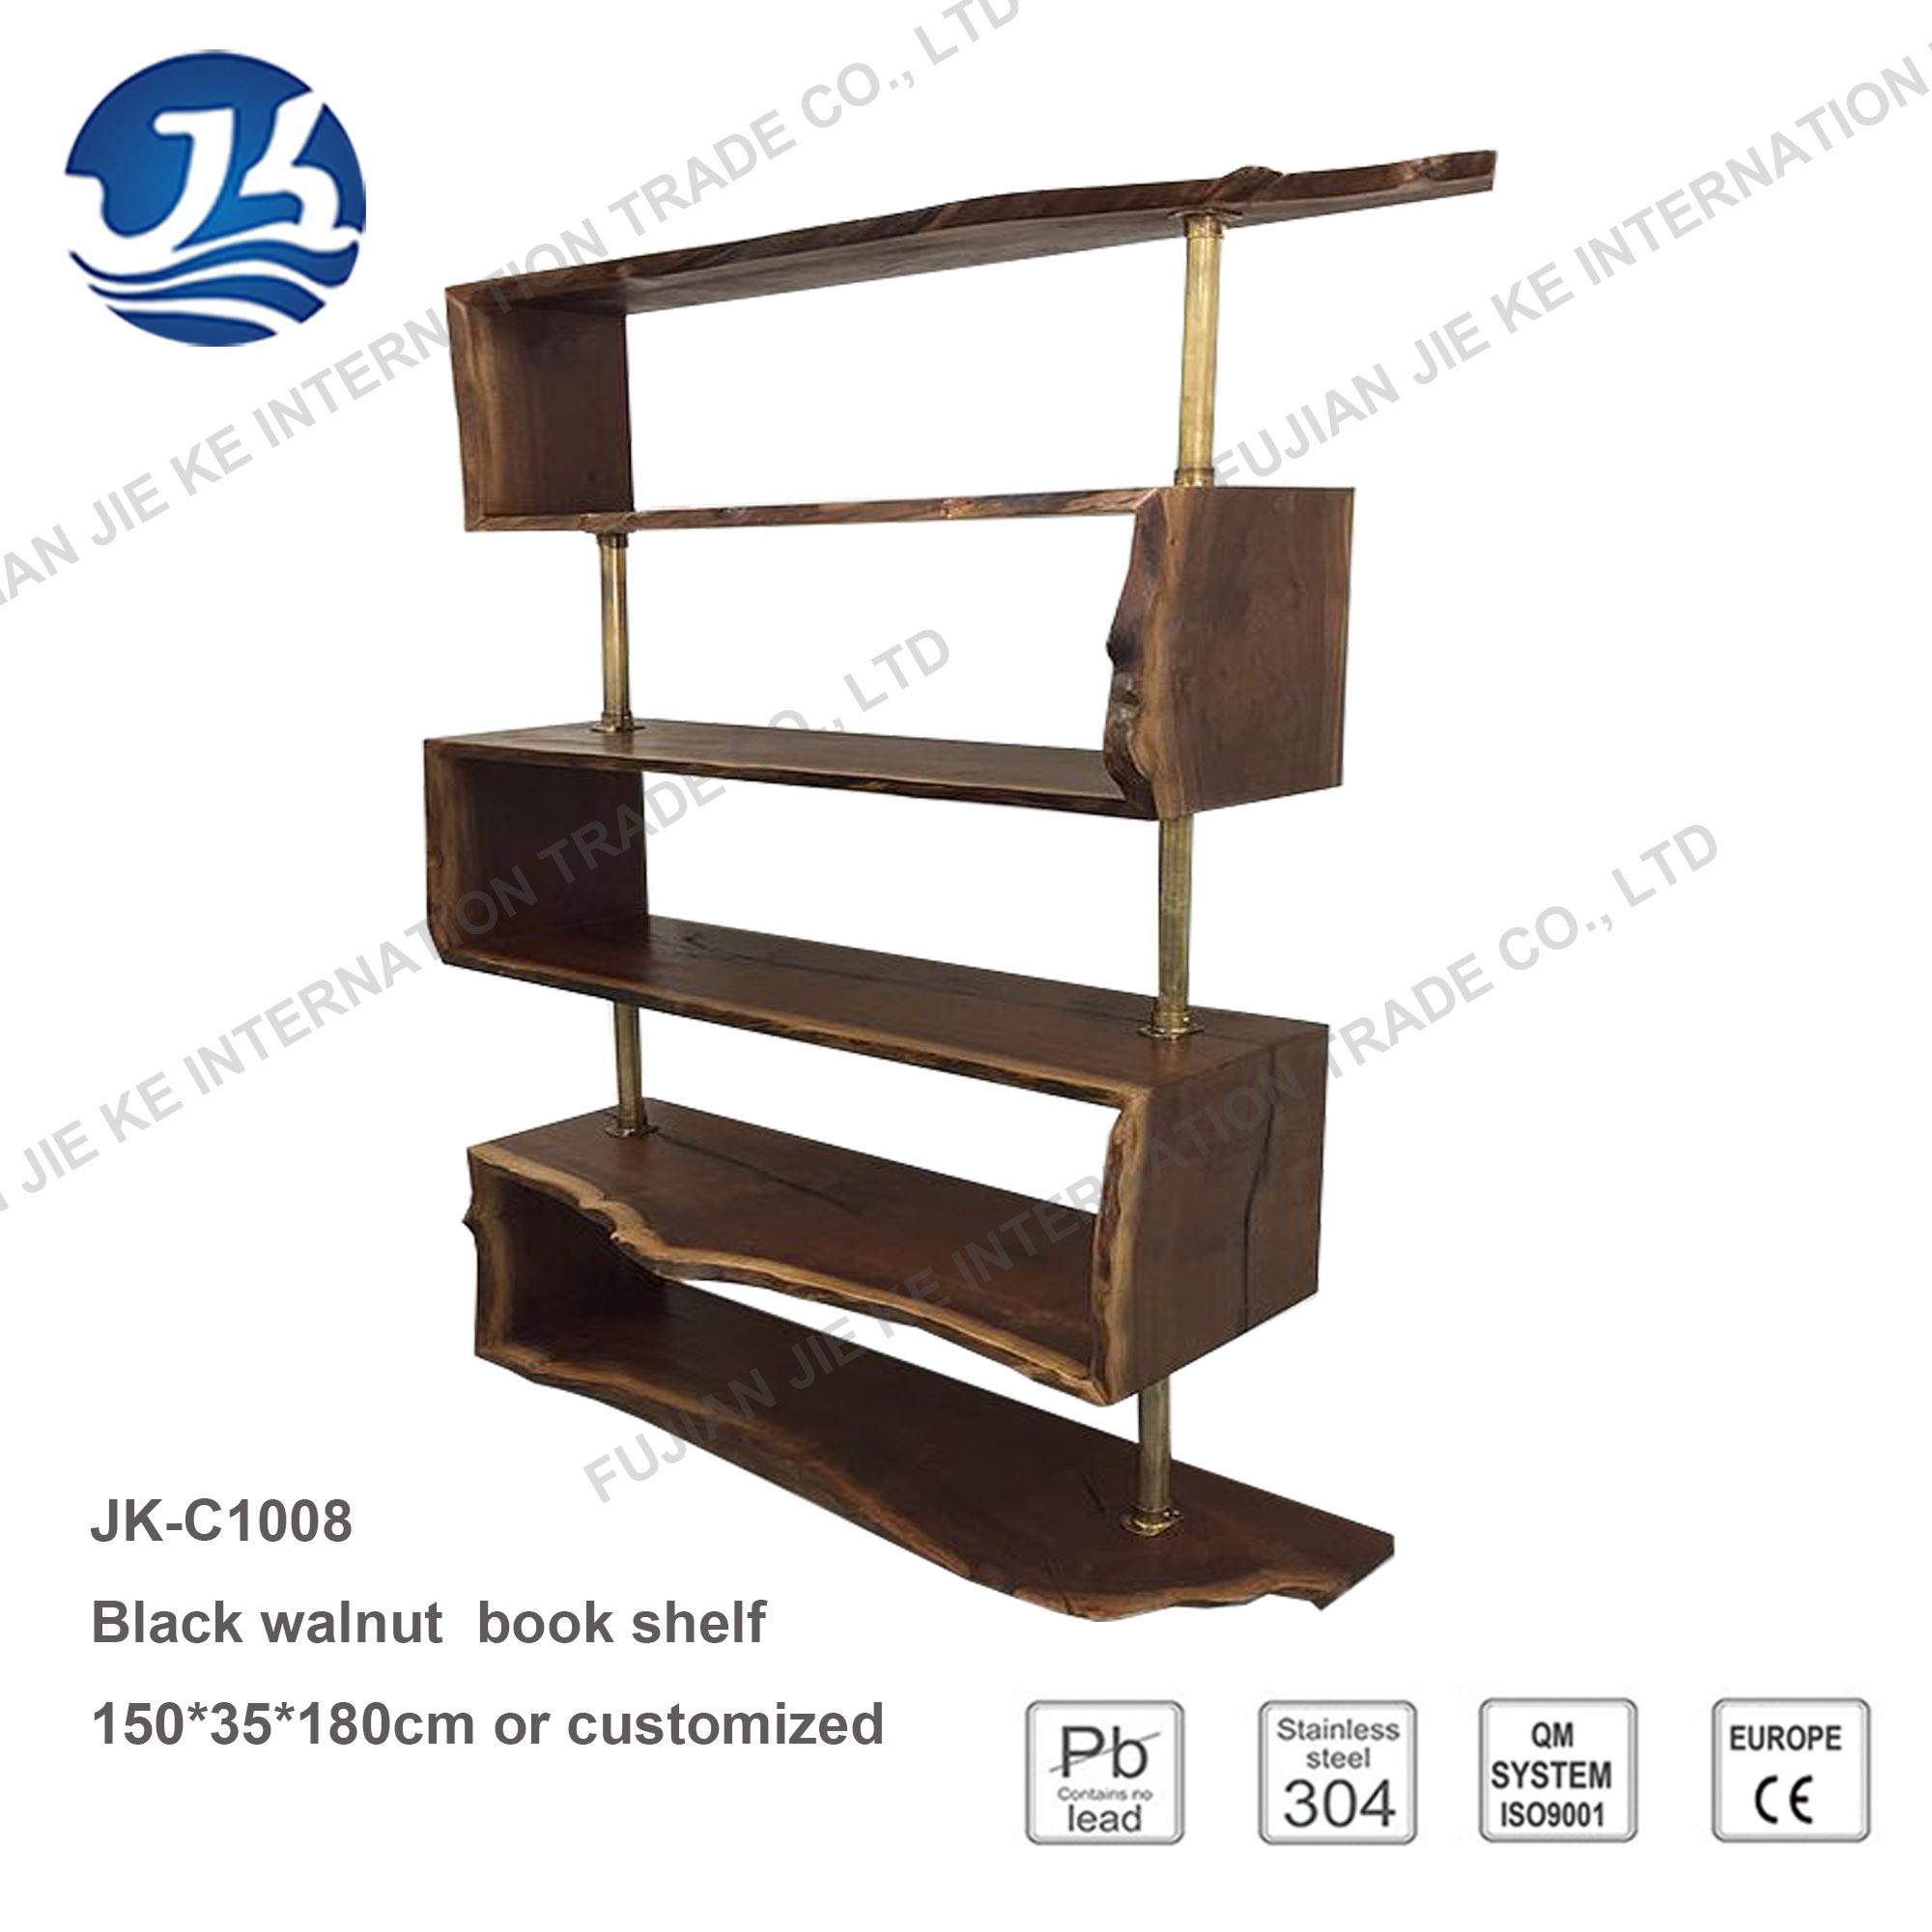 Hot Item Black Walnut Wood Book Shelf With Bronze Stainless Steel Frame